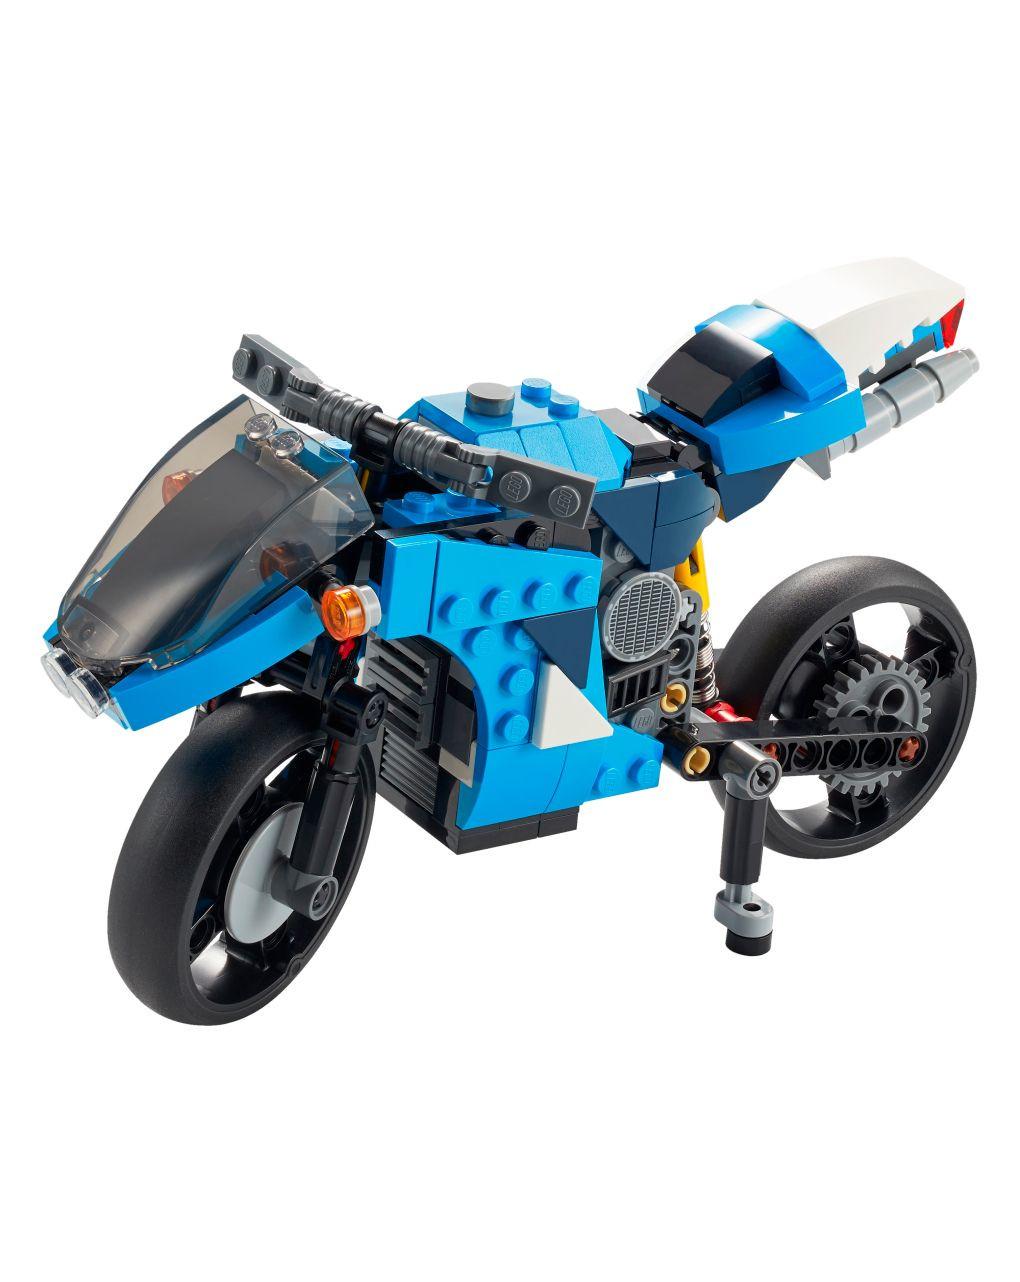 Lego creator - superbike - 31114 - LEGO